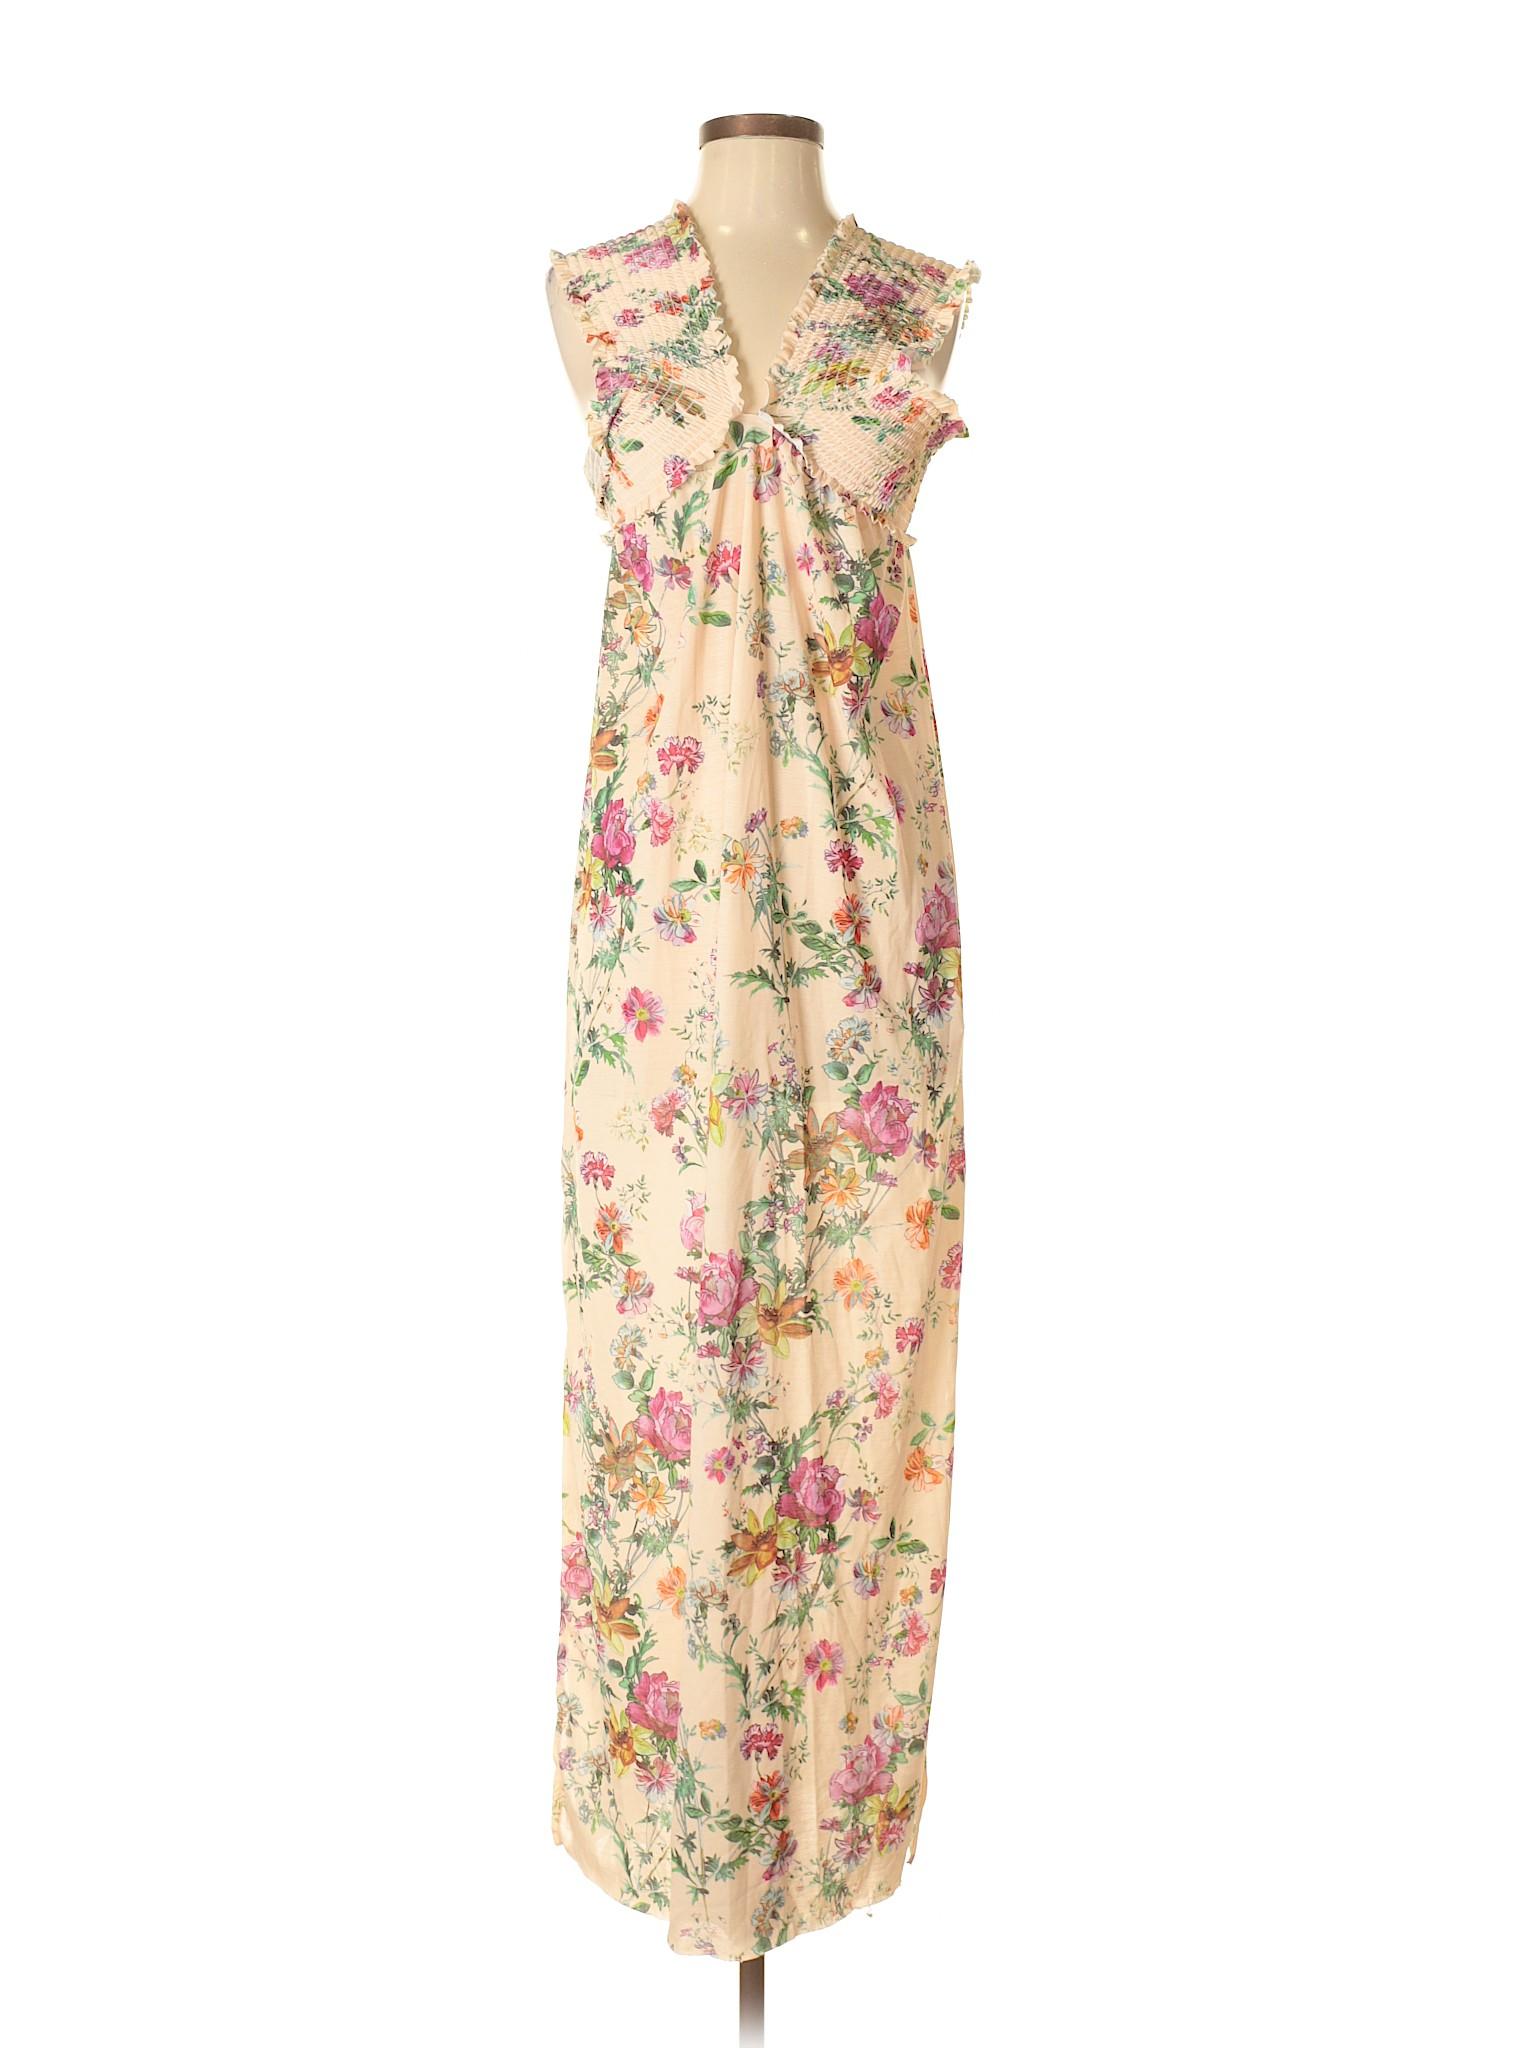 Boutique winter Dress Boutique winter Casual Casual Dress Zara Zara arwxdr